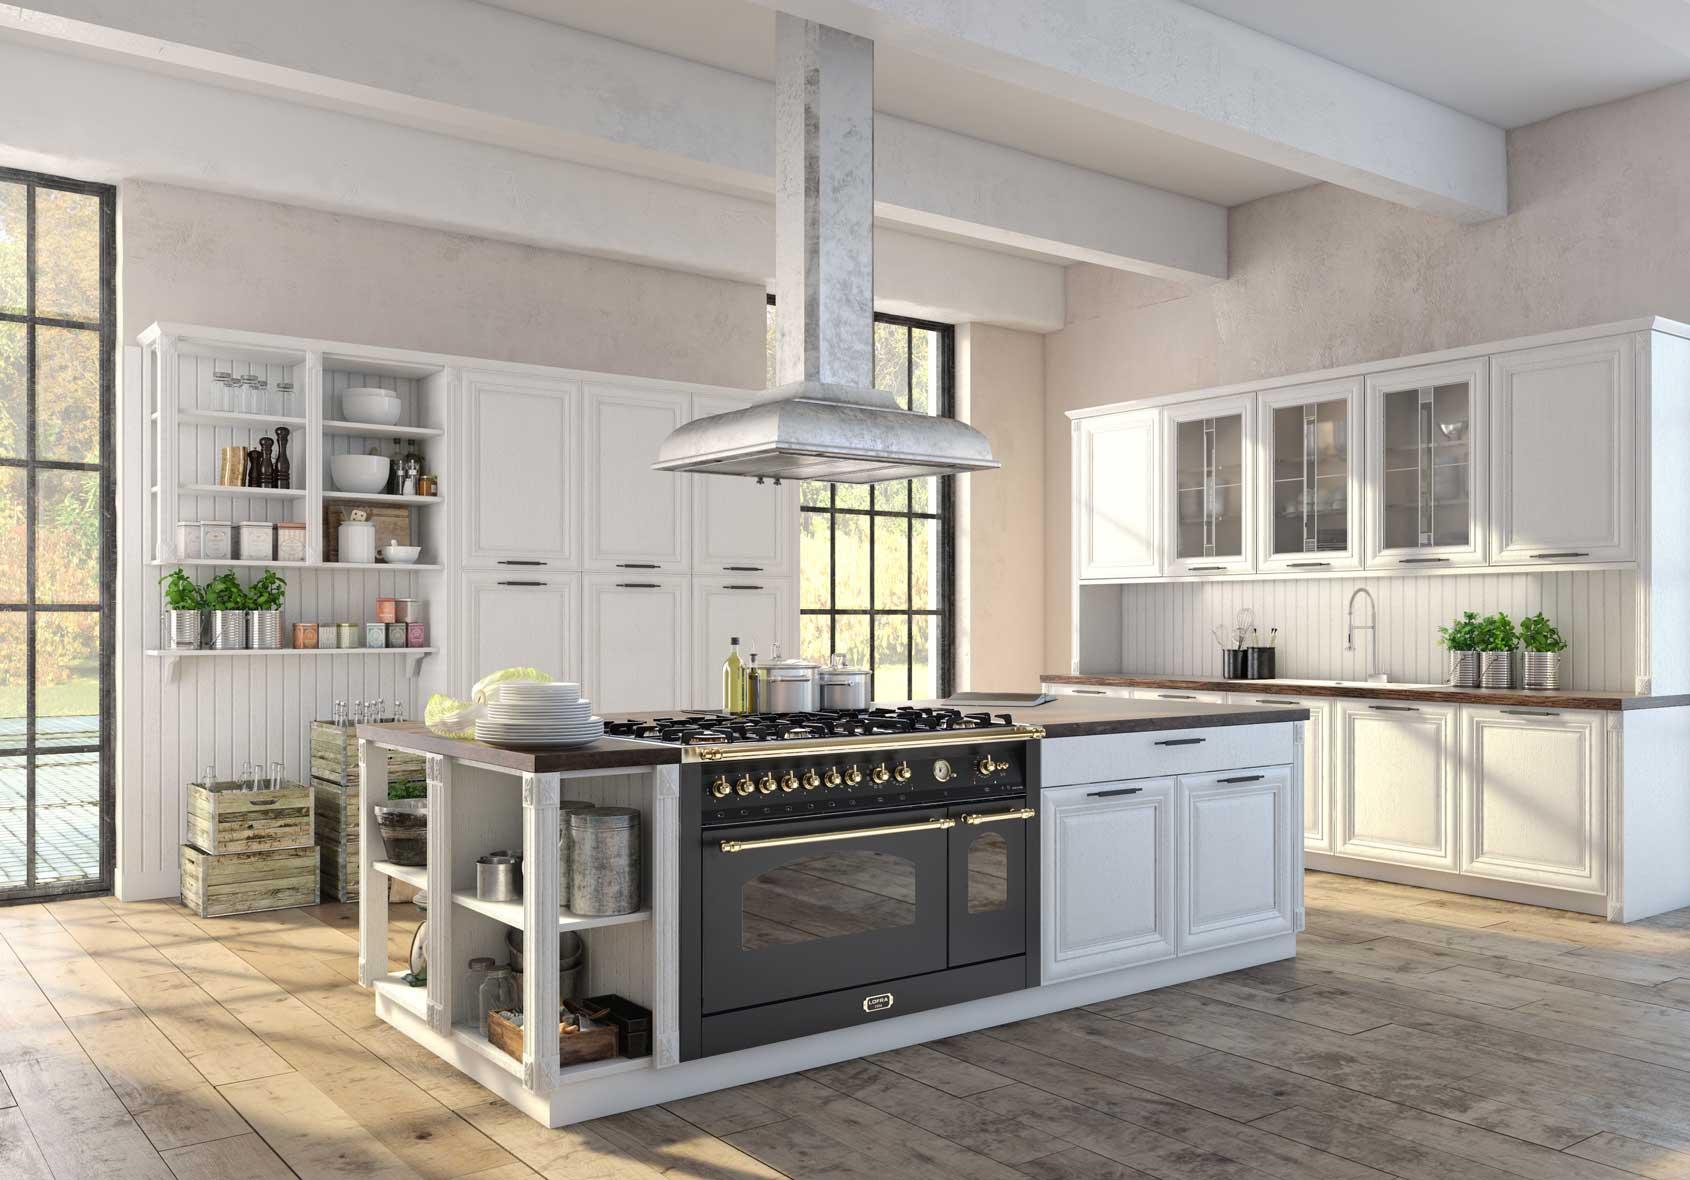 Cucina Dolcevita 120. stile Rustico/Cowntry - Lofra